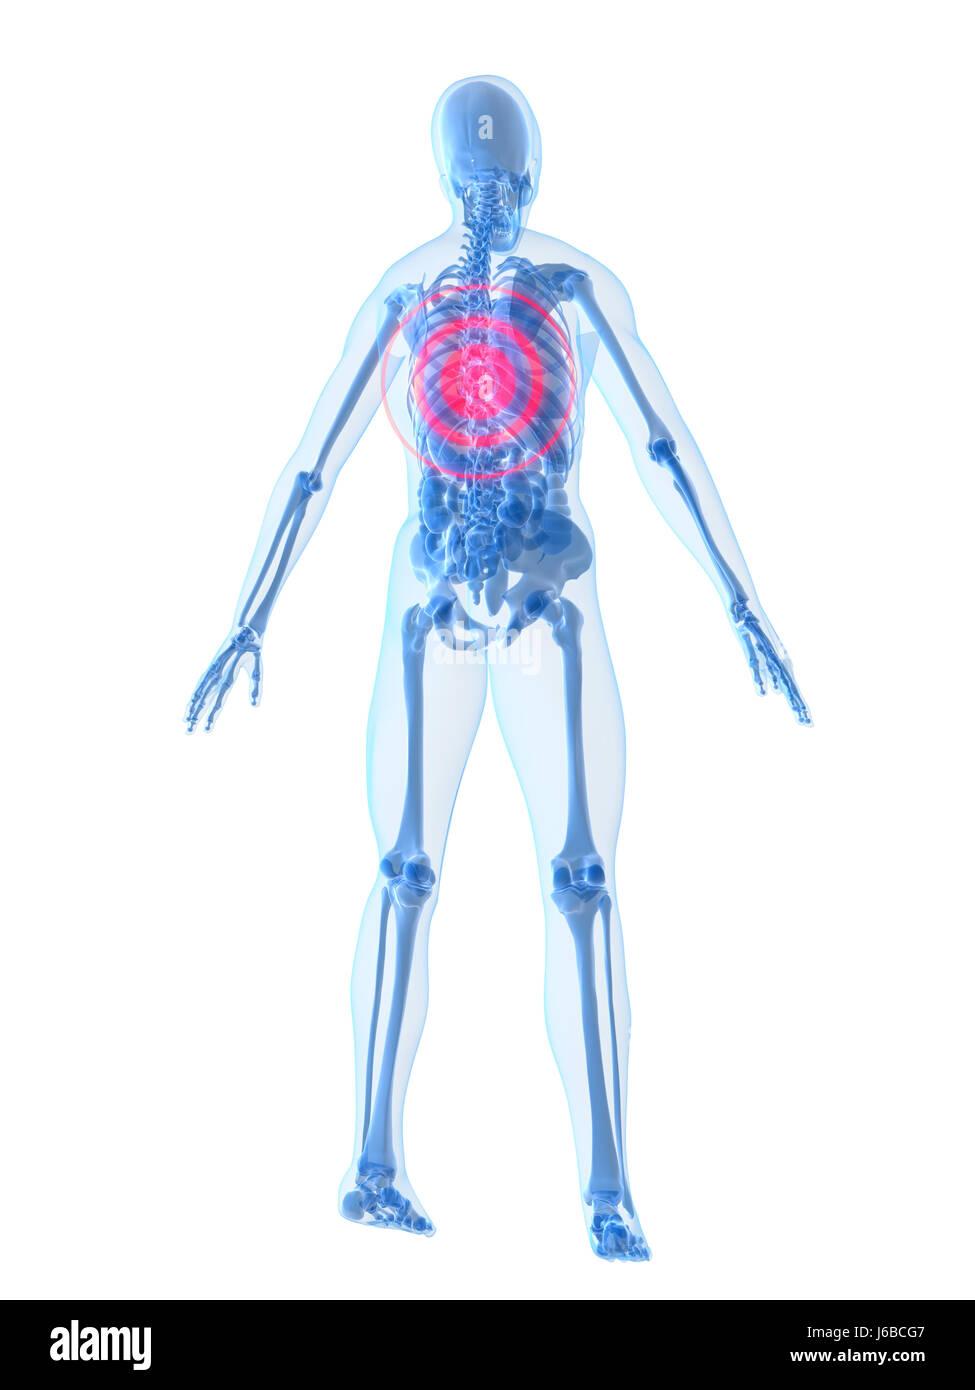 Human Backbone Stockfotos & Human Backbone Bilder - Seite 13 - Alamy